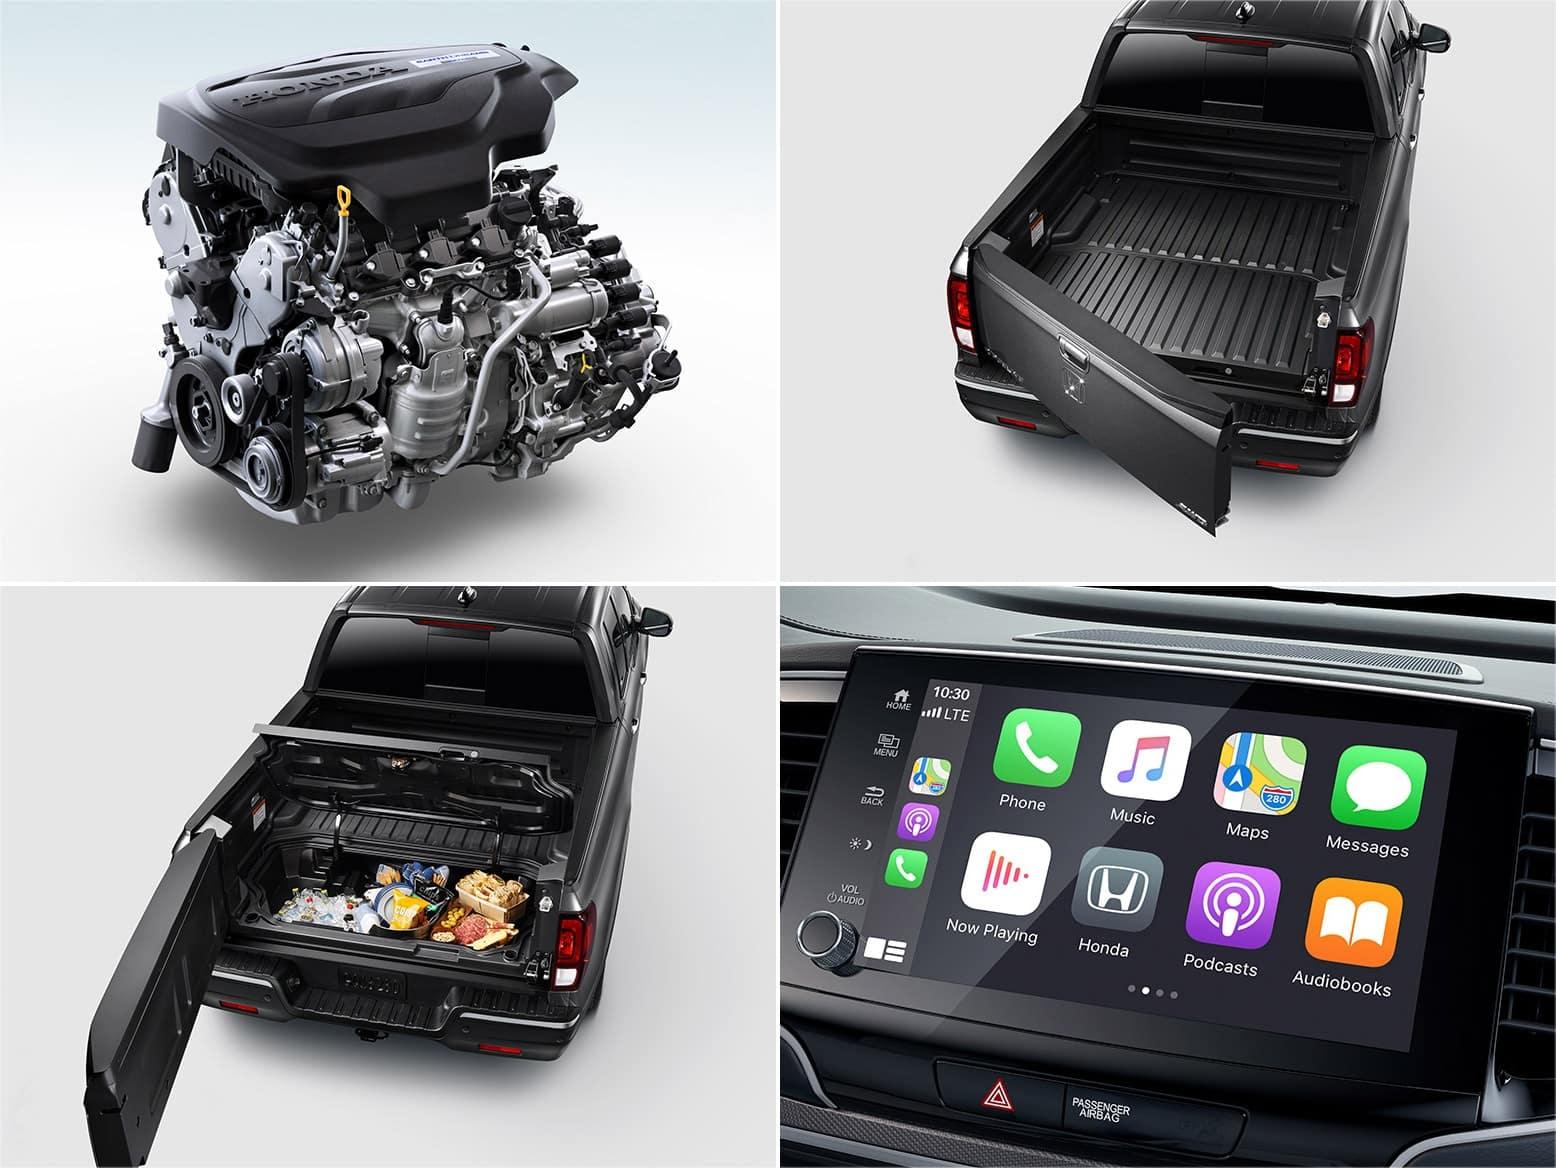 2021 Honda Ridgeline Sport features